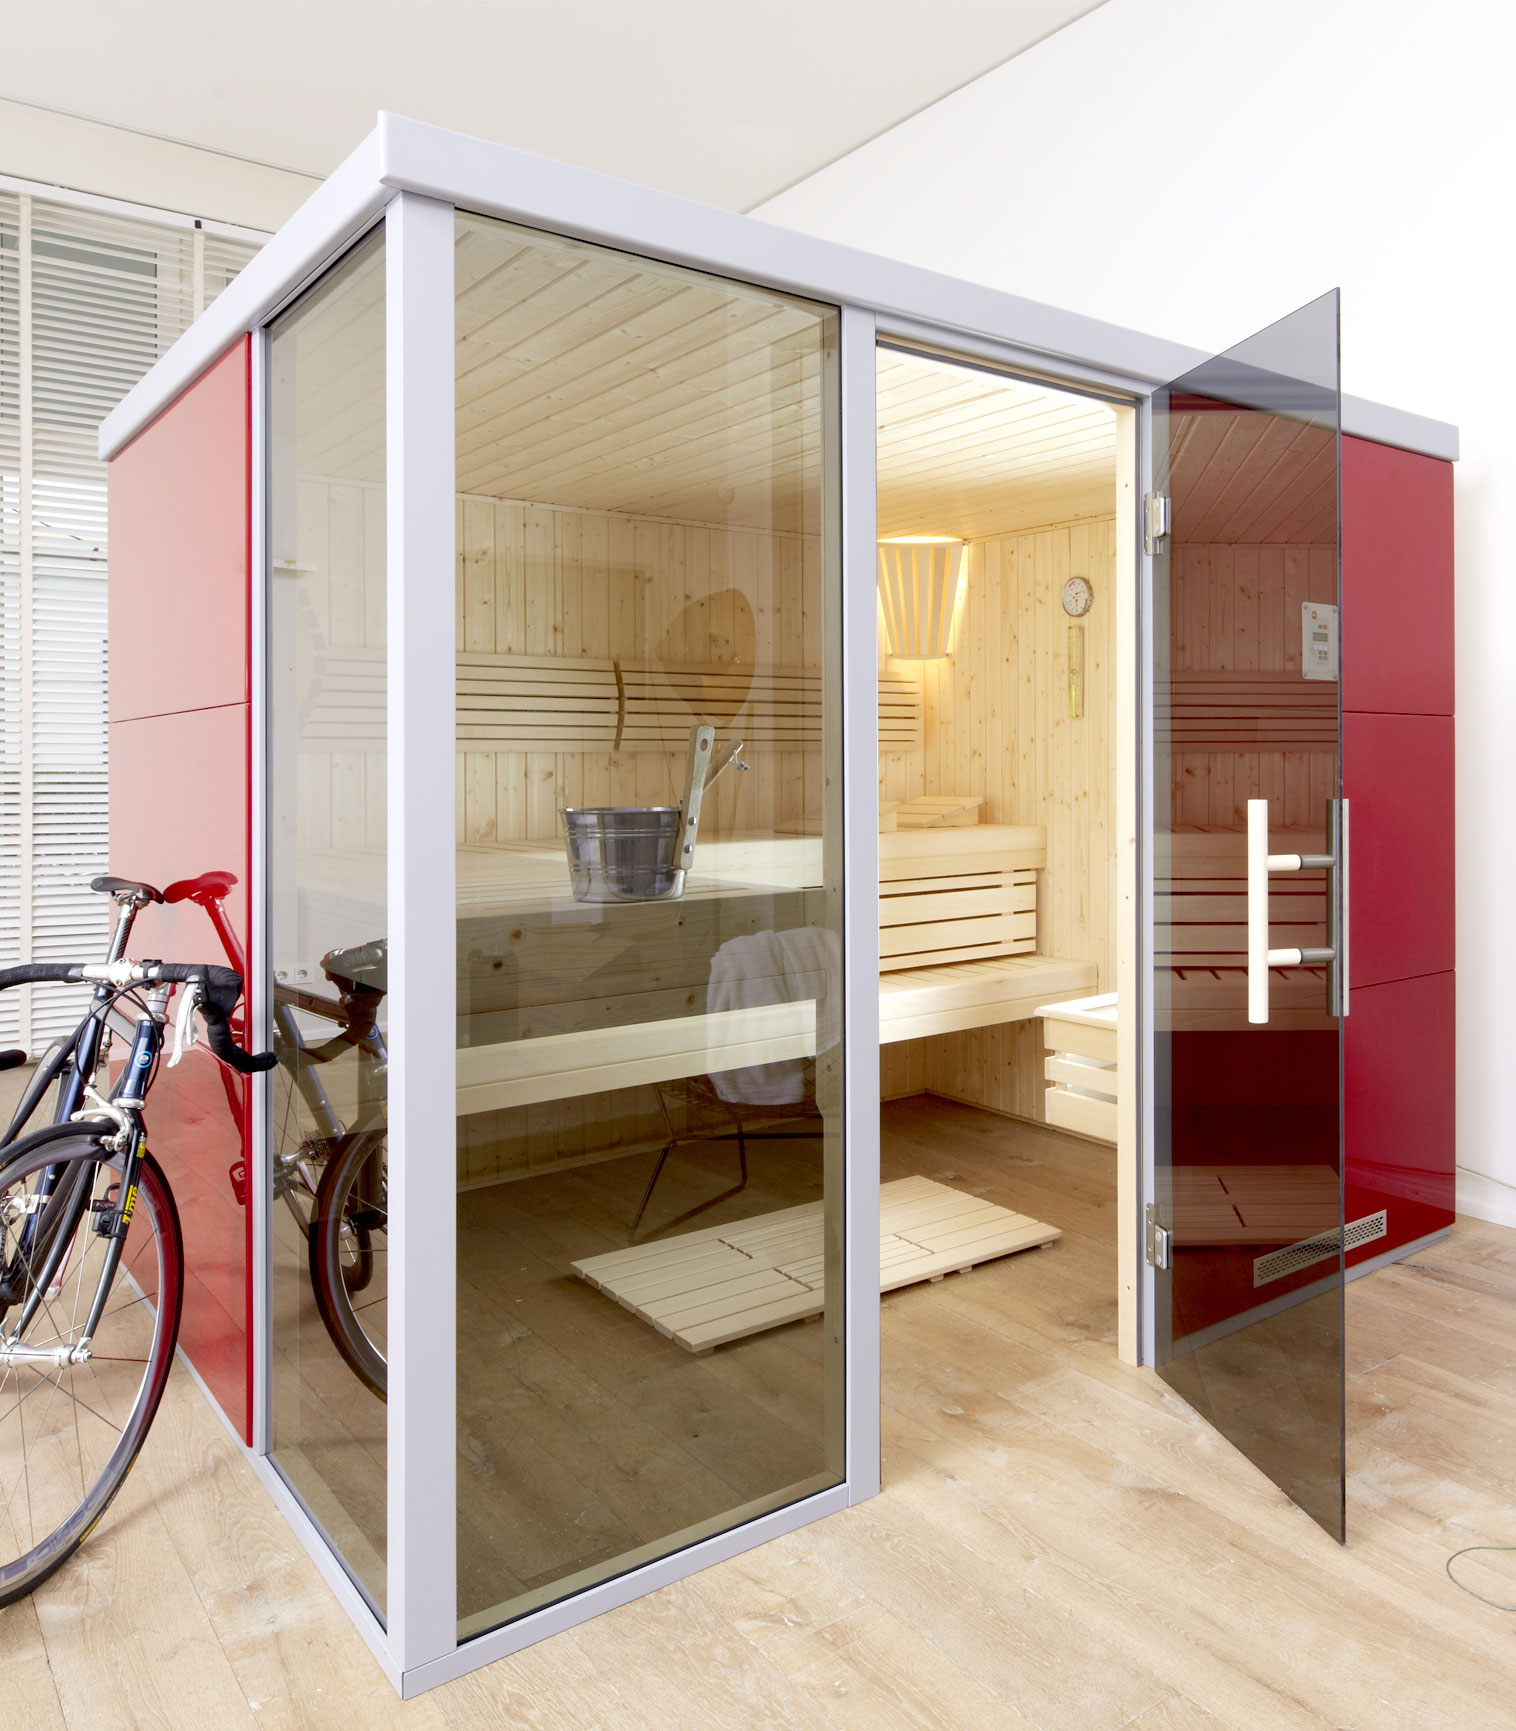 Weka Sauna / Wellnissage Designsauna I L Rosso 68mm ohne Saunaofen Bild 1